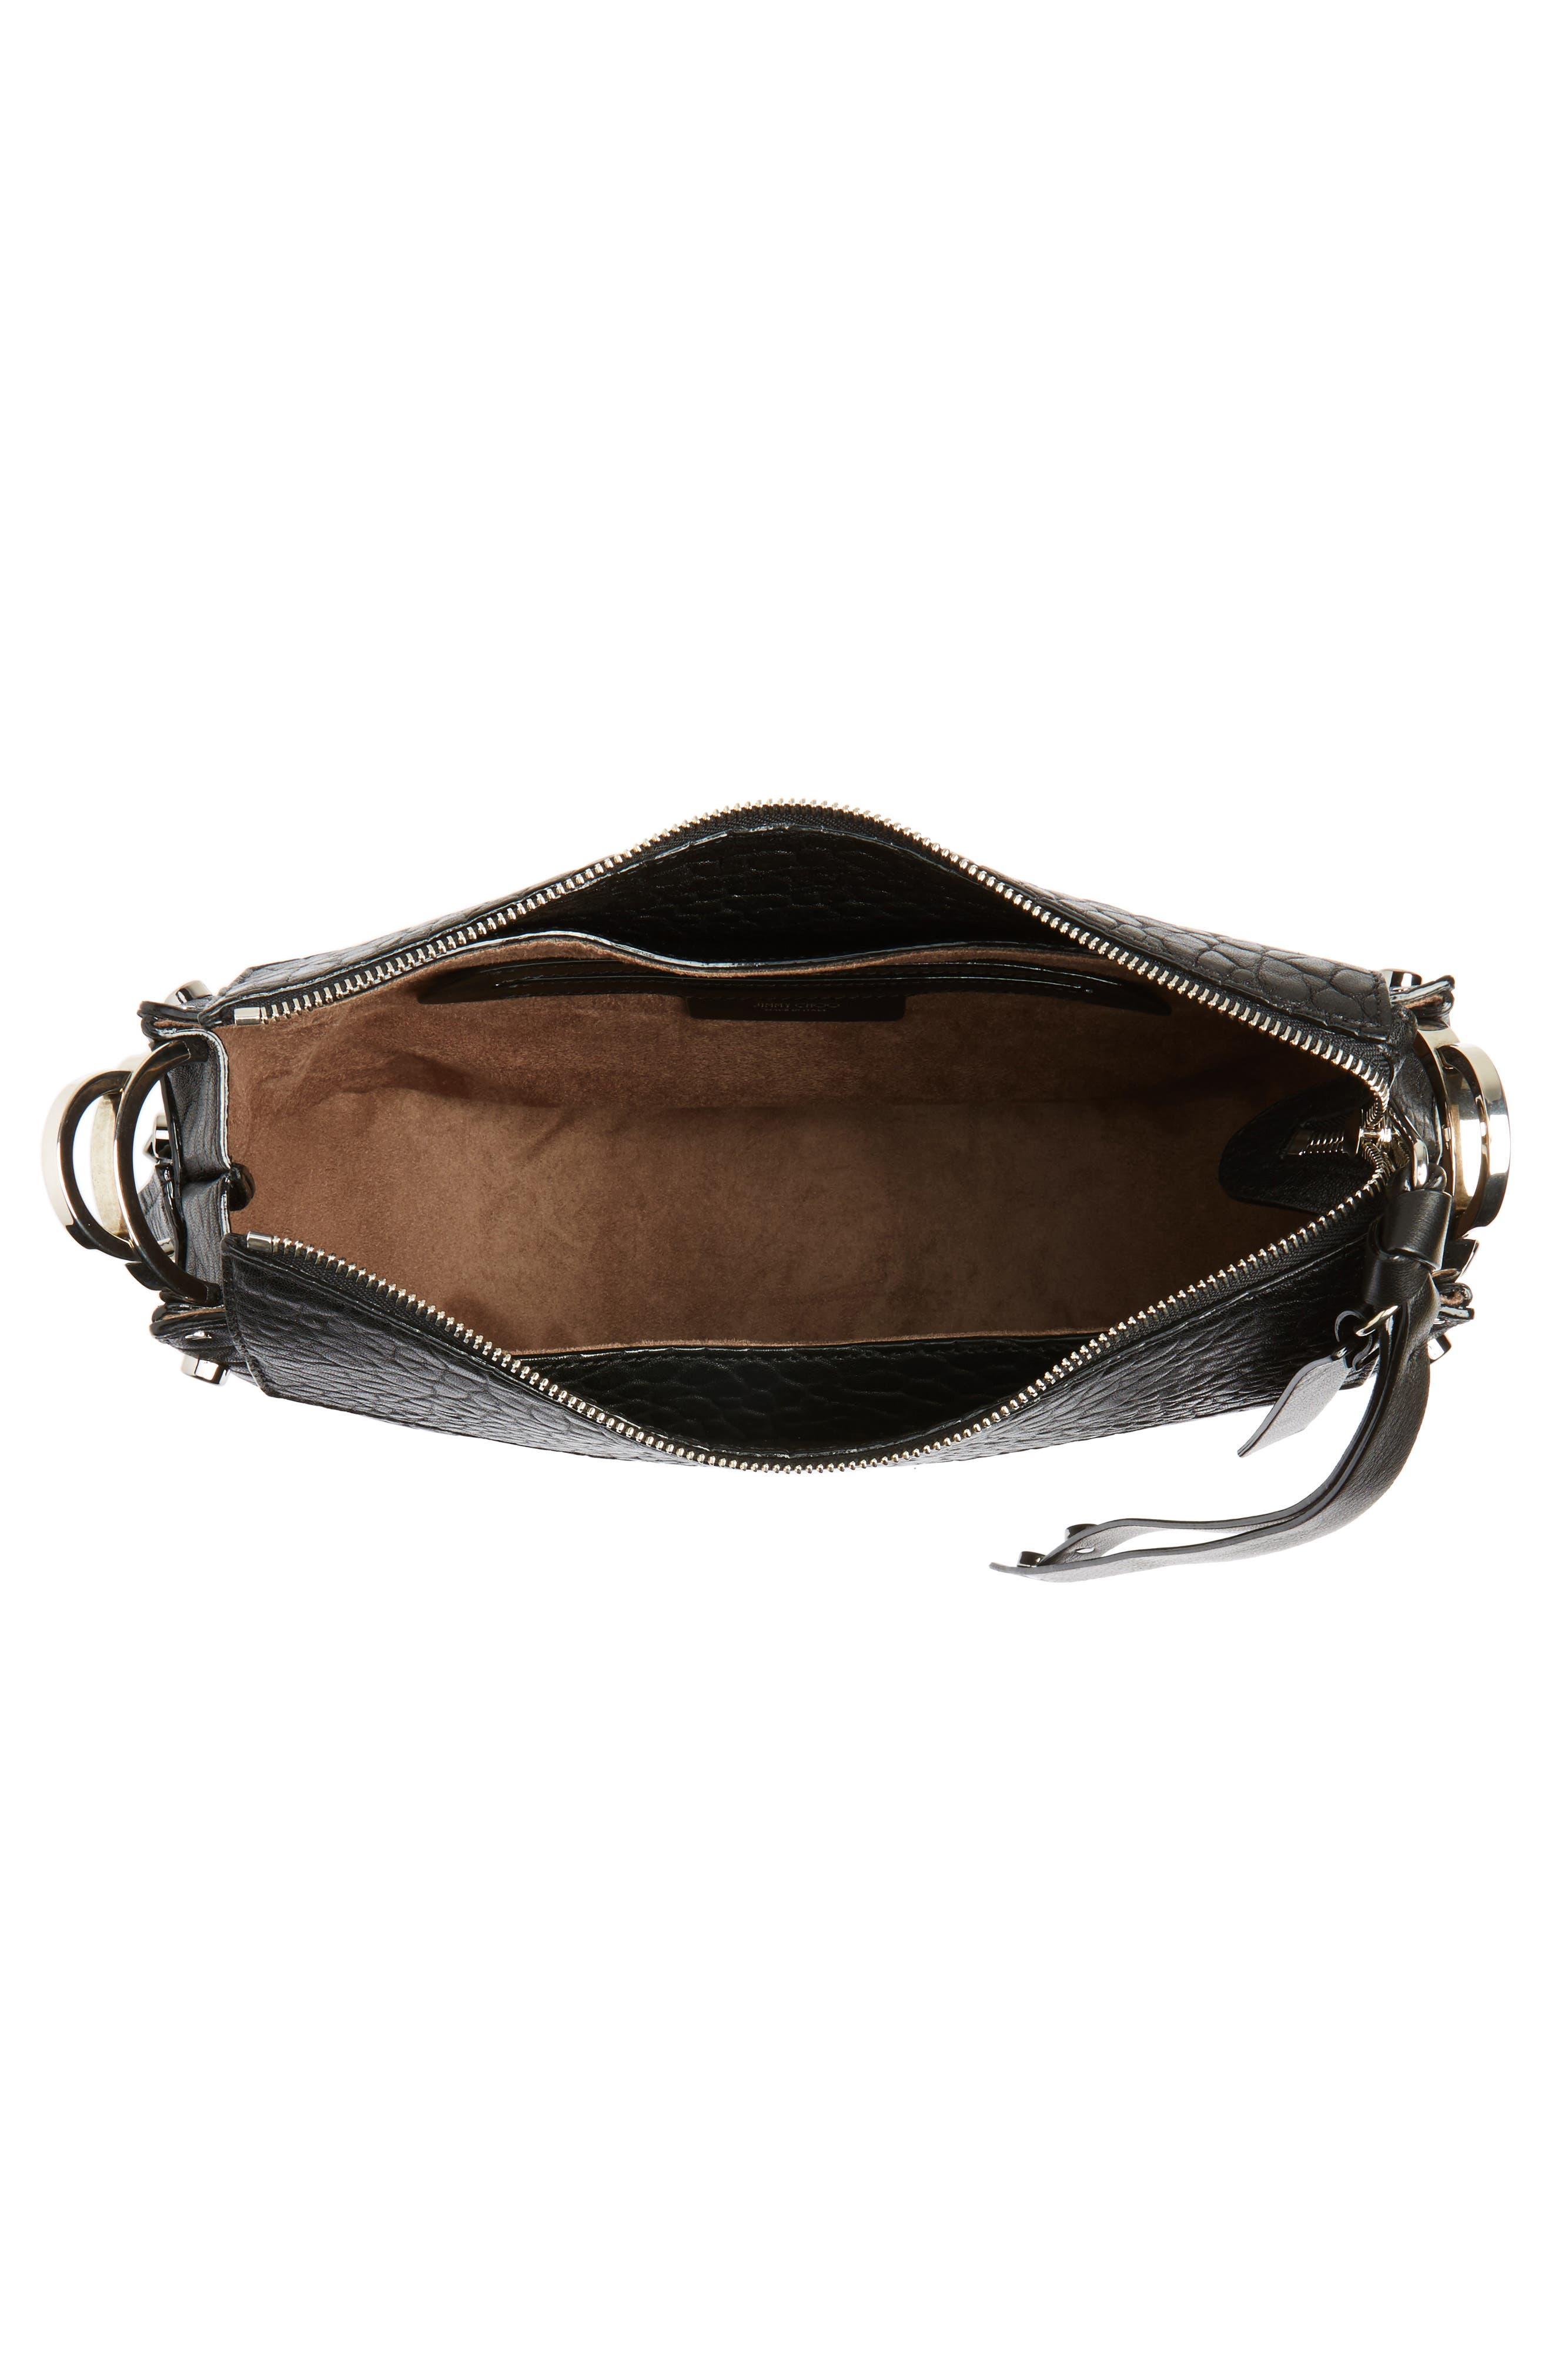 Artie Studded Leather Hobo Bag,                             Alternate thumbnail 4, color,                             001